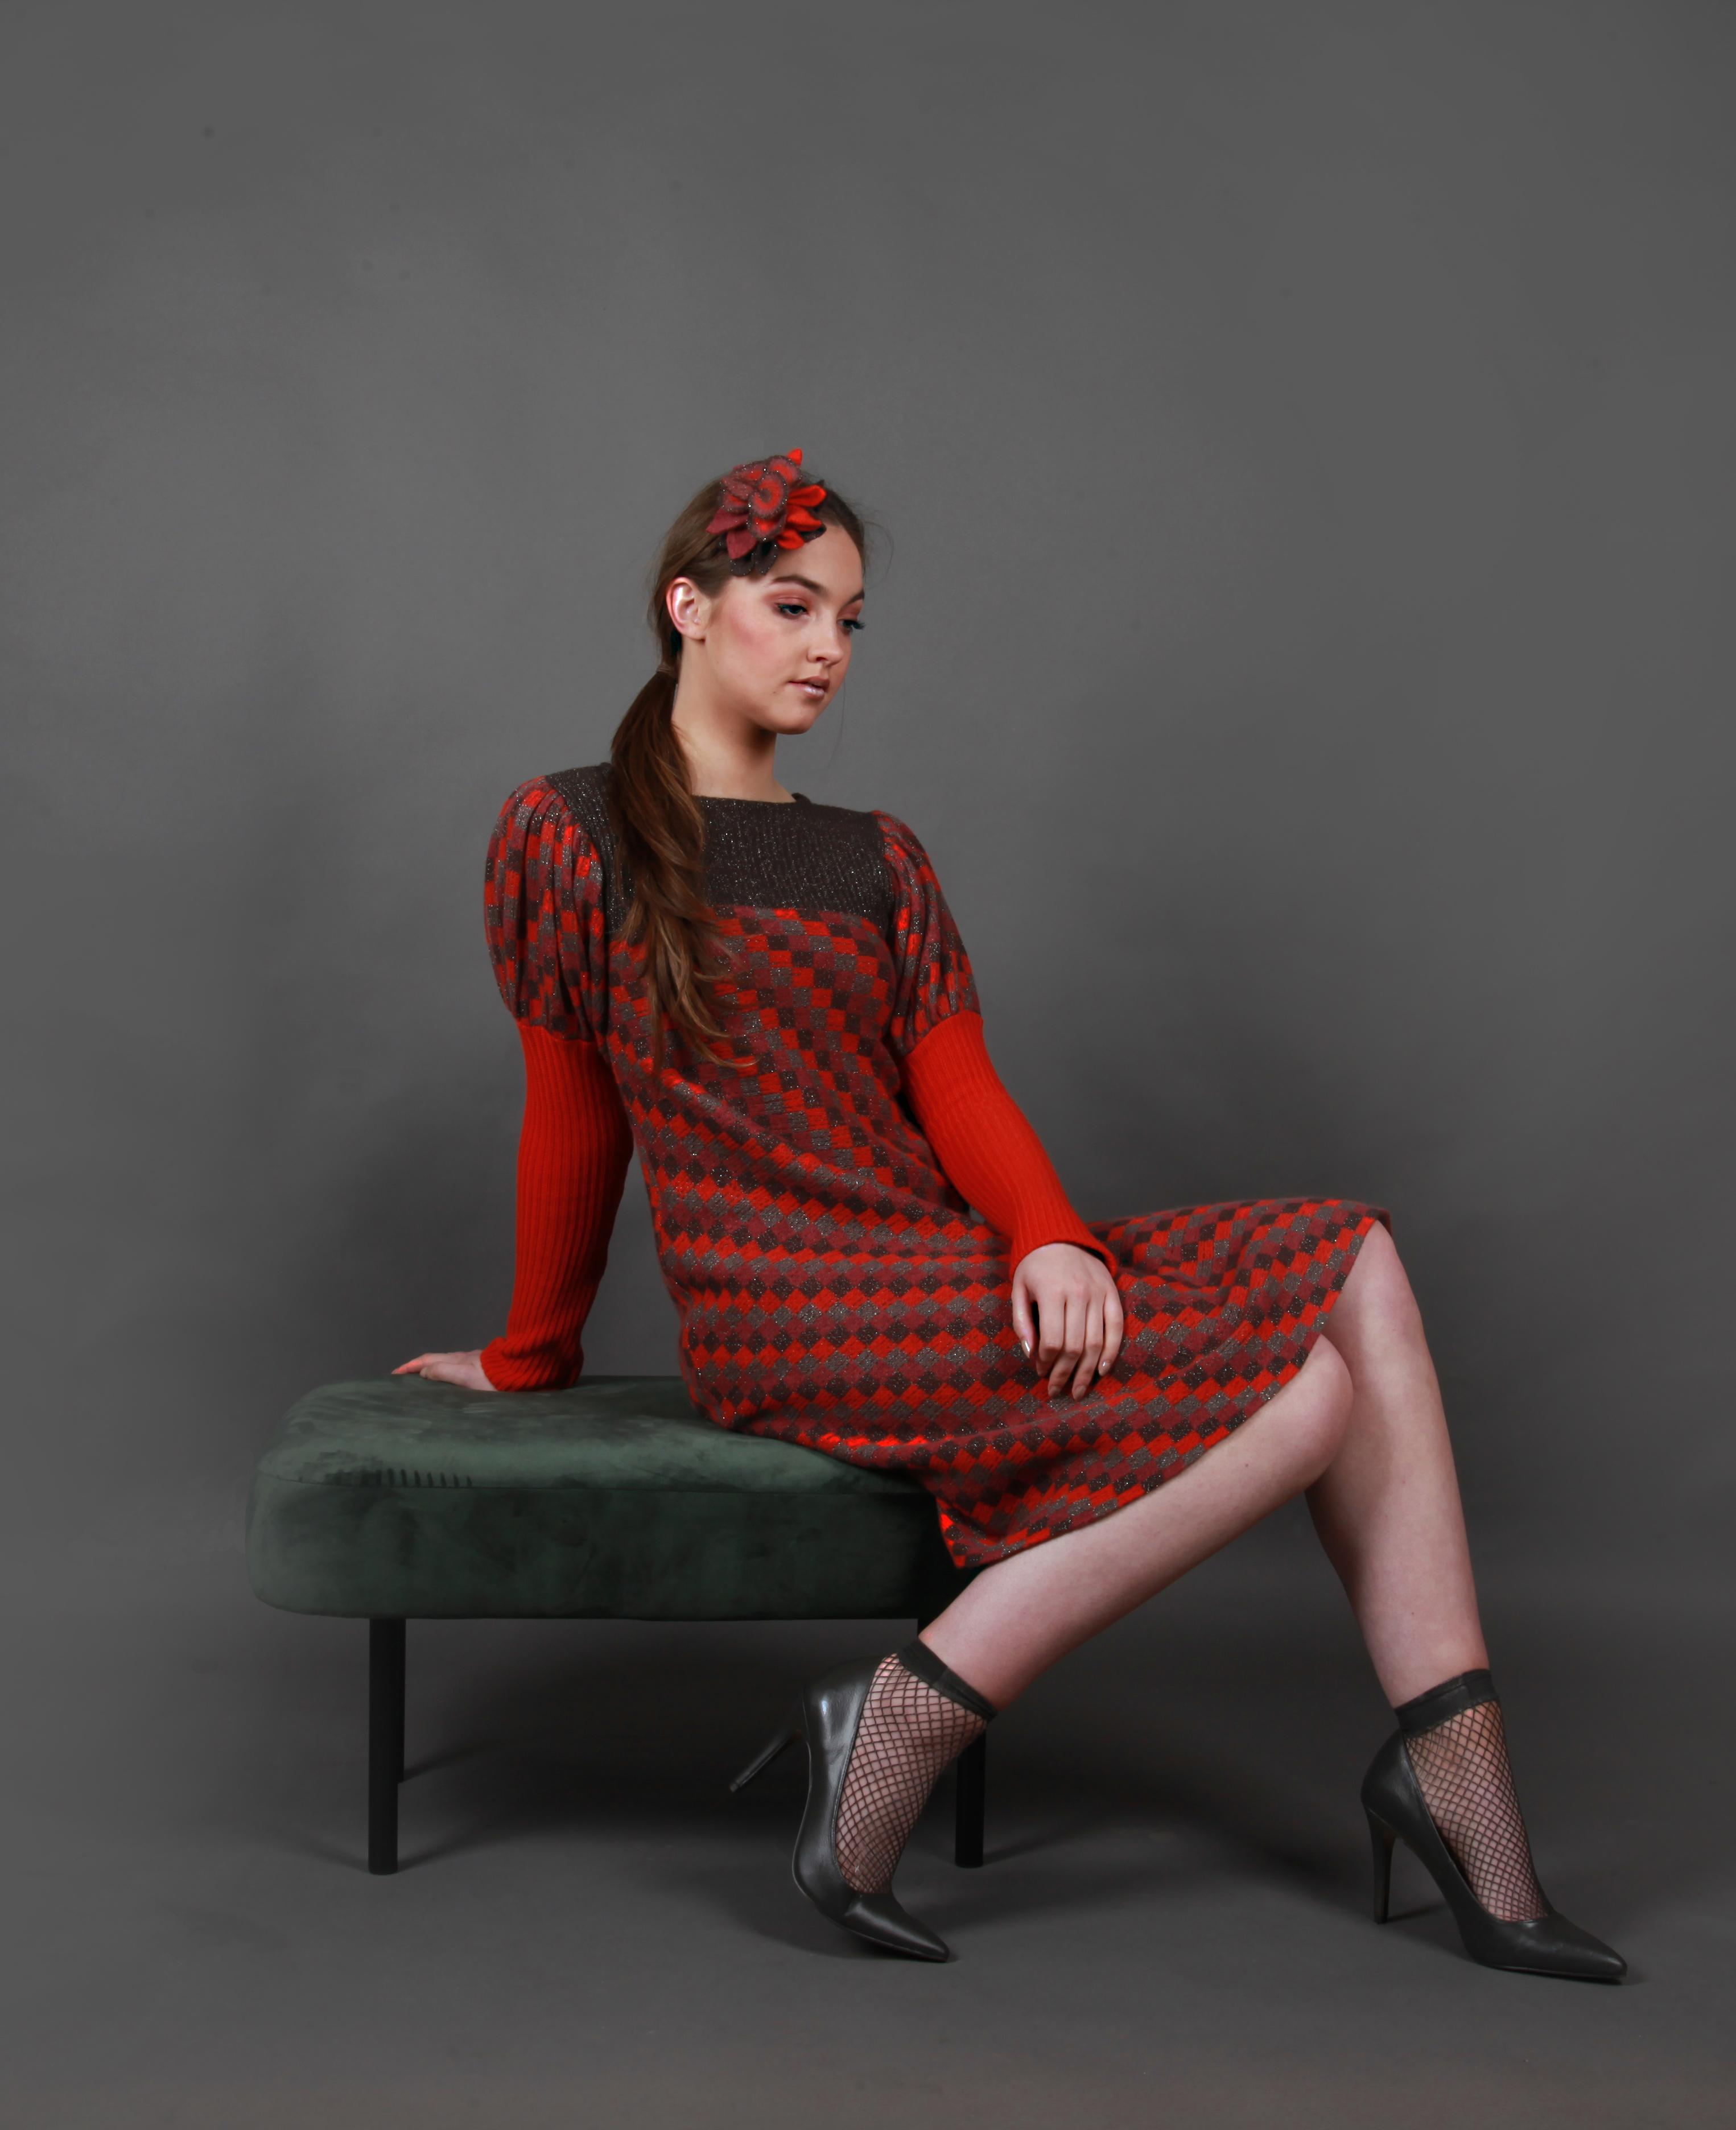 Chequer pattern dress